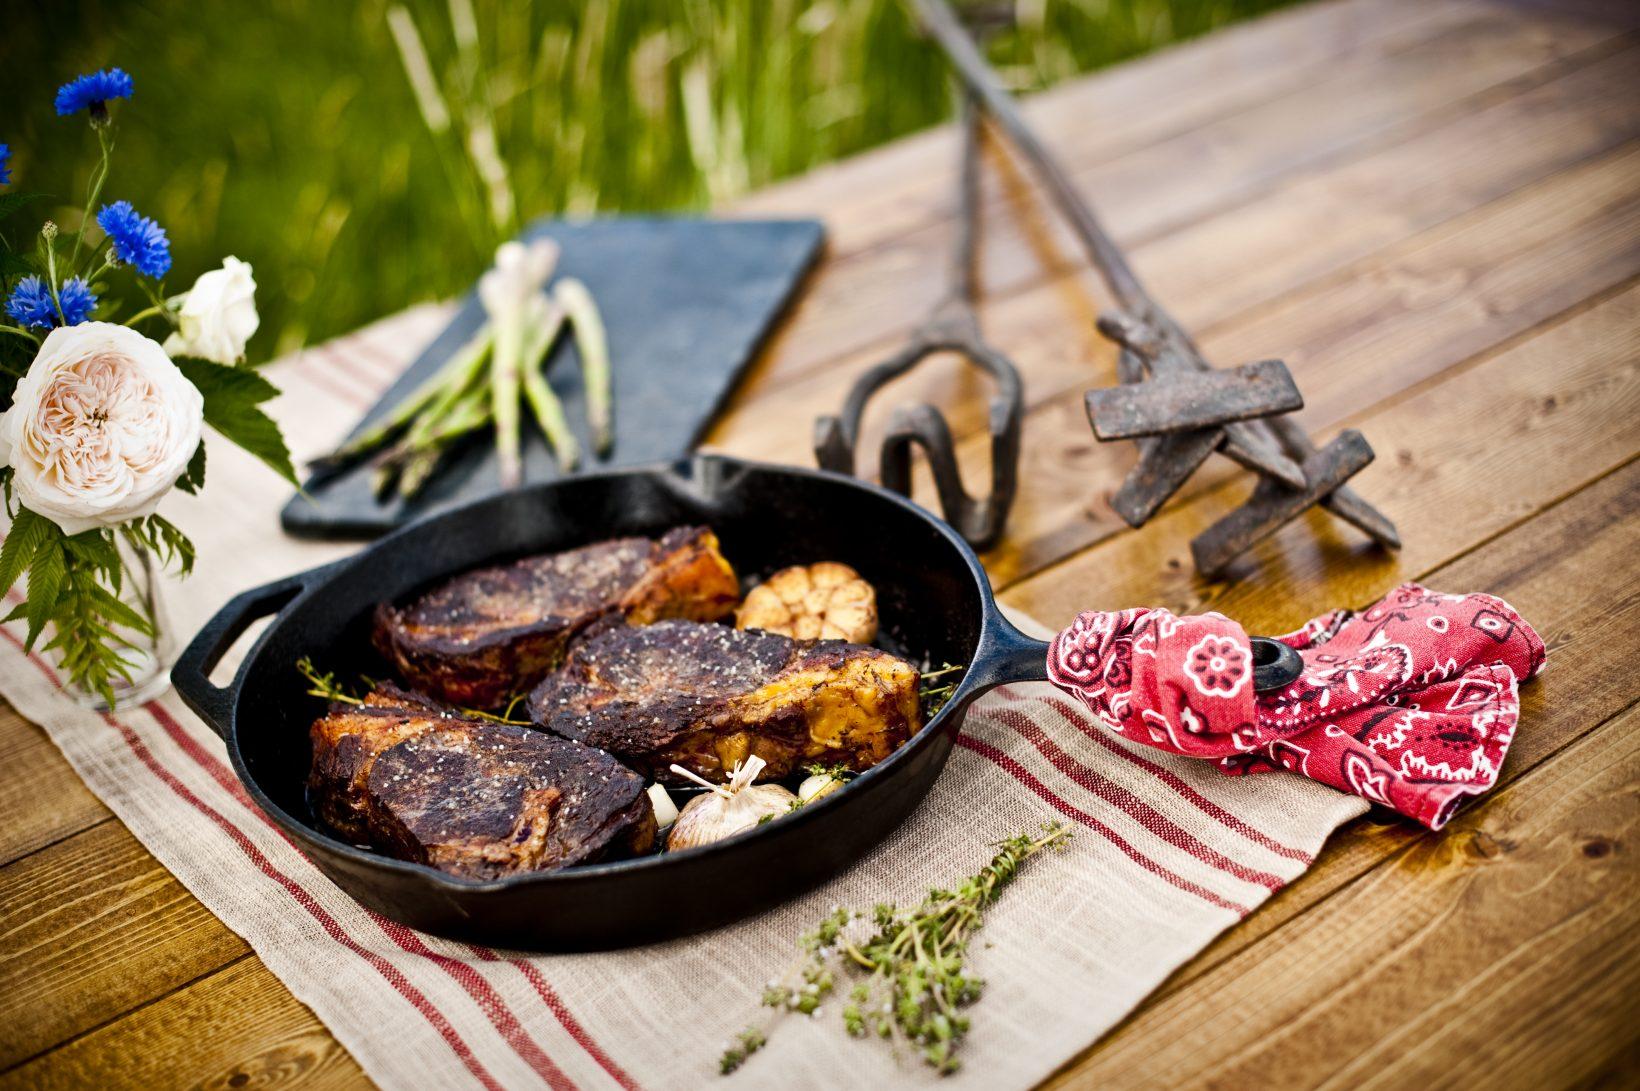 Cast iron seared ribeye steaks from local purveyor Yellowstone grass-fed beef